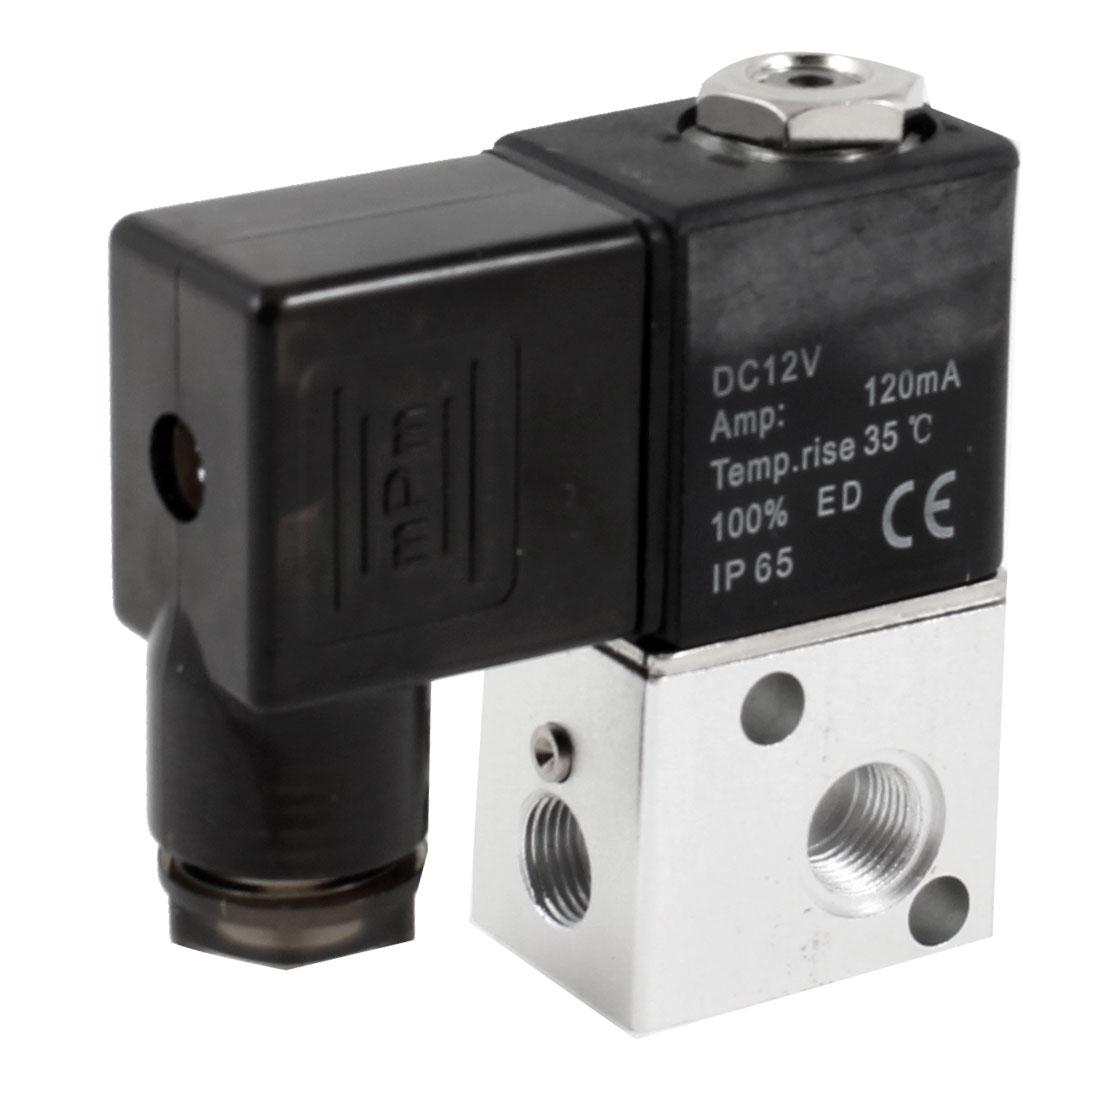 3V1-06 2 Position 3 Way Pneumatic Solenoid Valve DC 12V 120mA